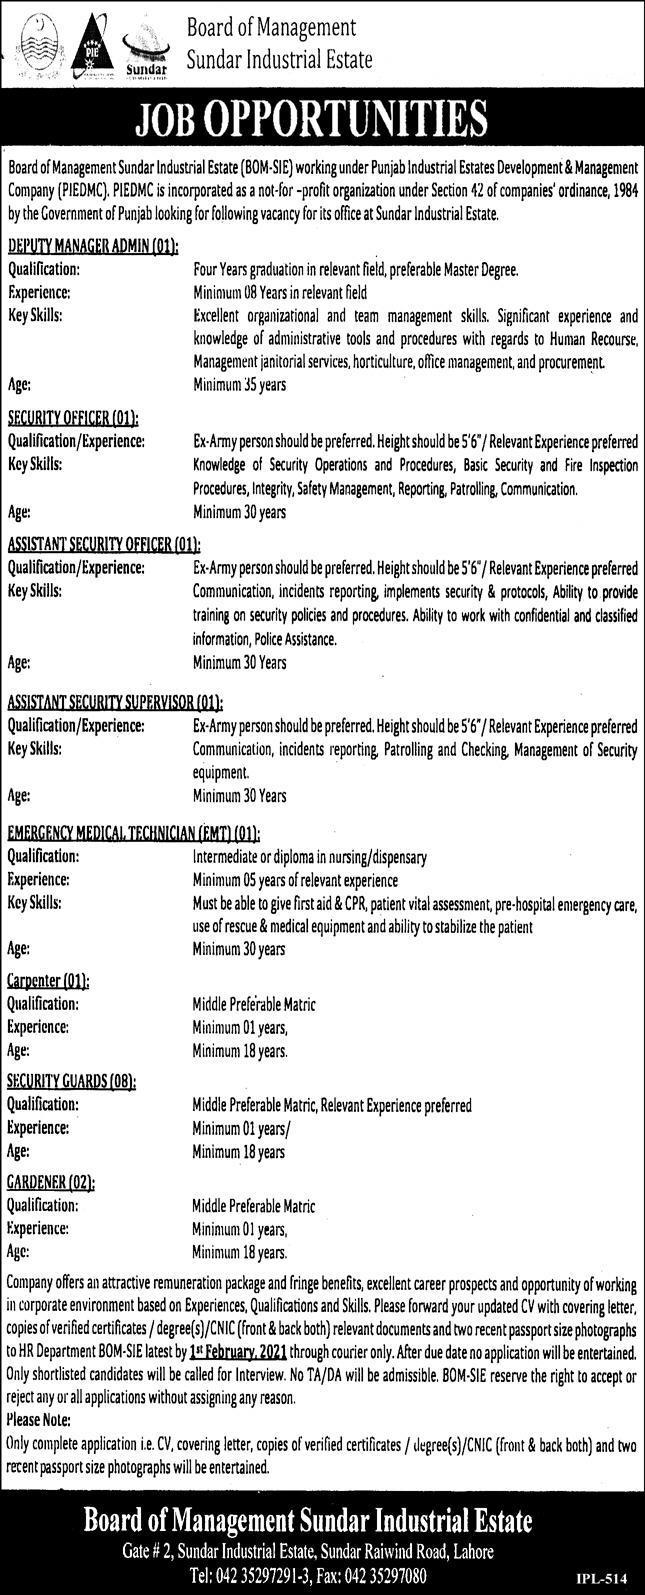 Deputy Manager Admin Jobs in Board of Management Sundar Industrial Estate 21 Jan 2021